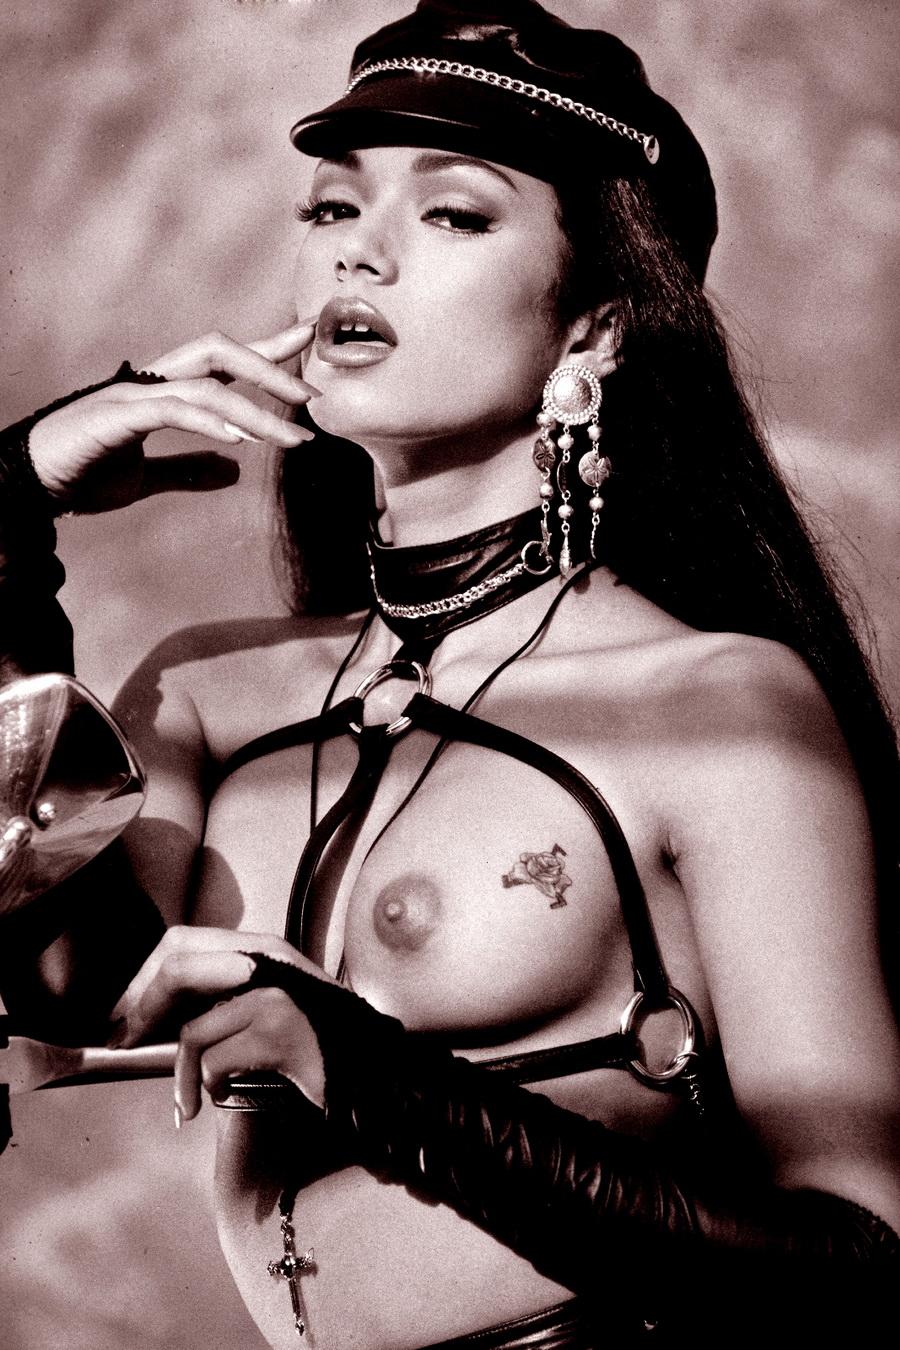 Табаша кэш порно актриса 5 фотография